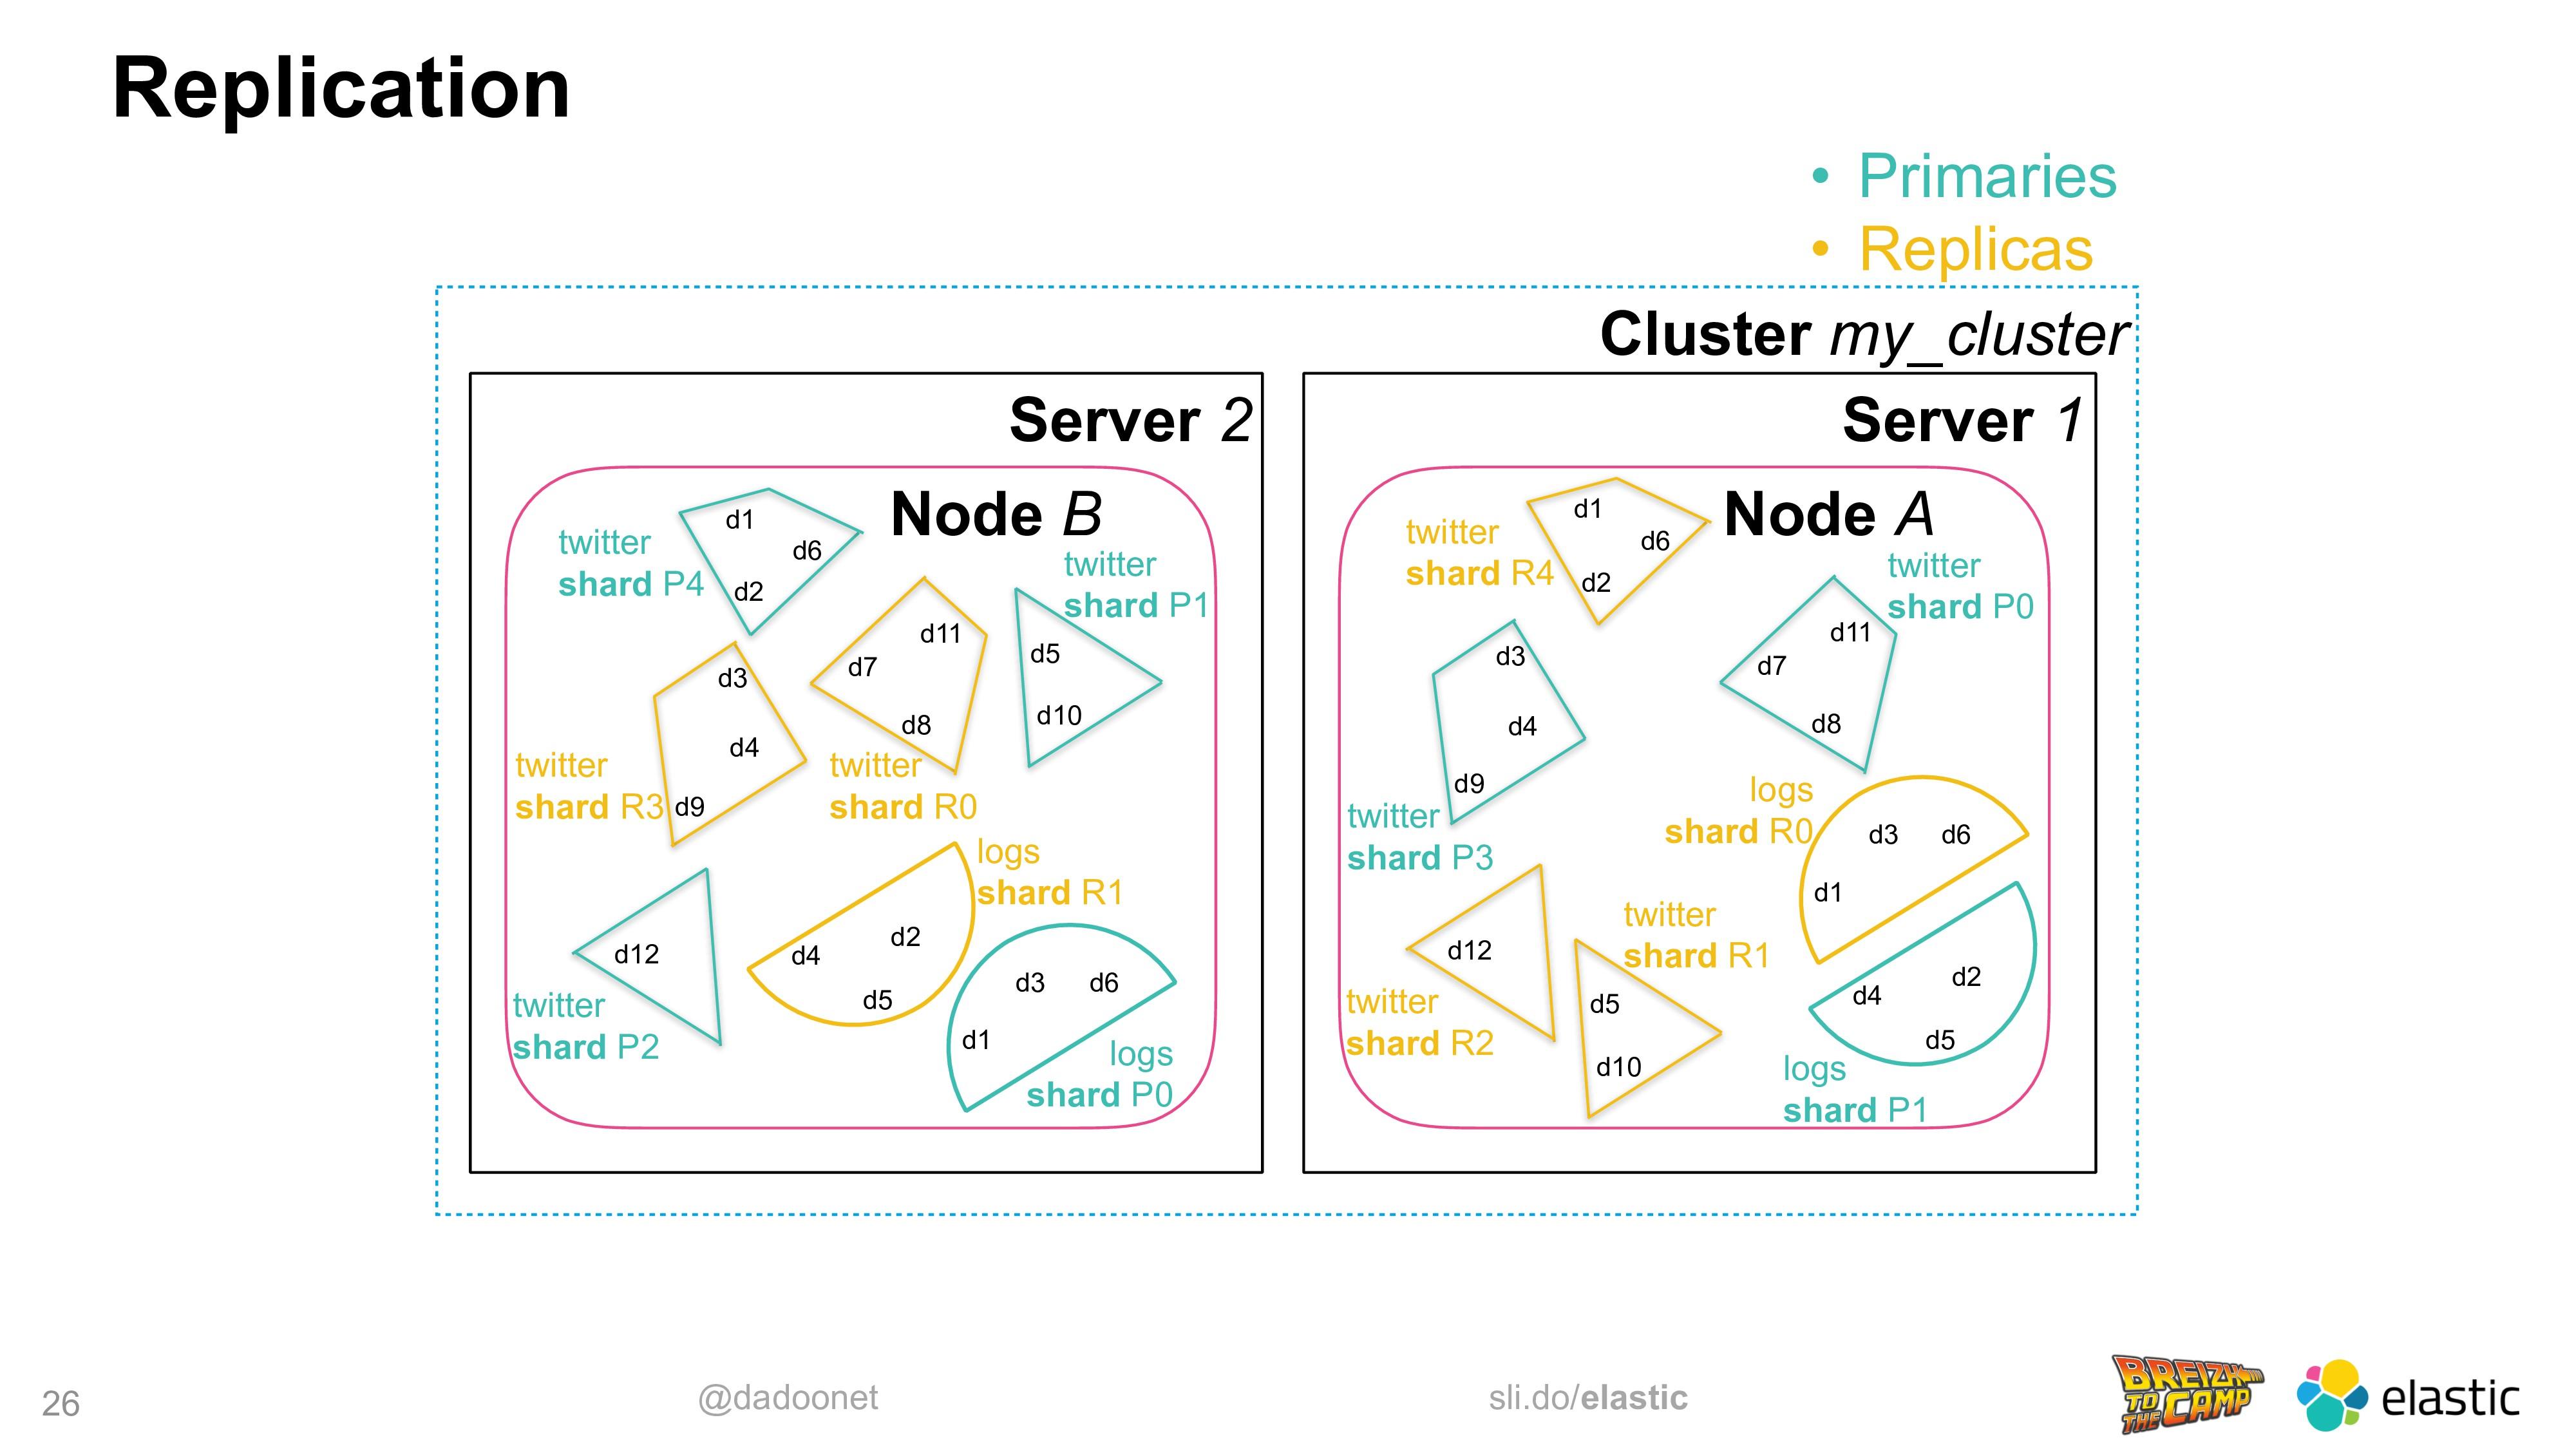 @dadoonet sli.do/elastic 26 Replication Cluster...